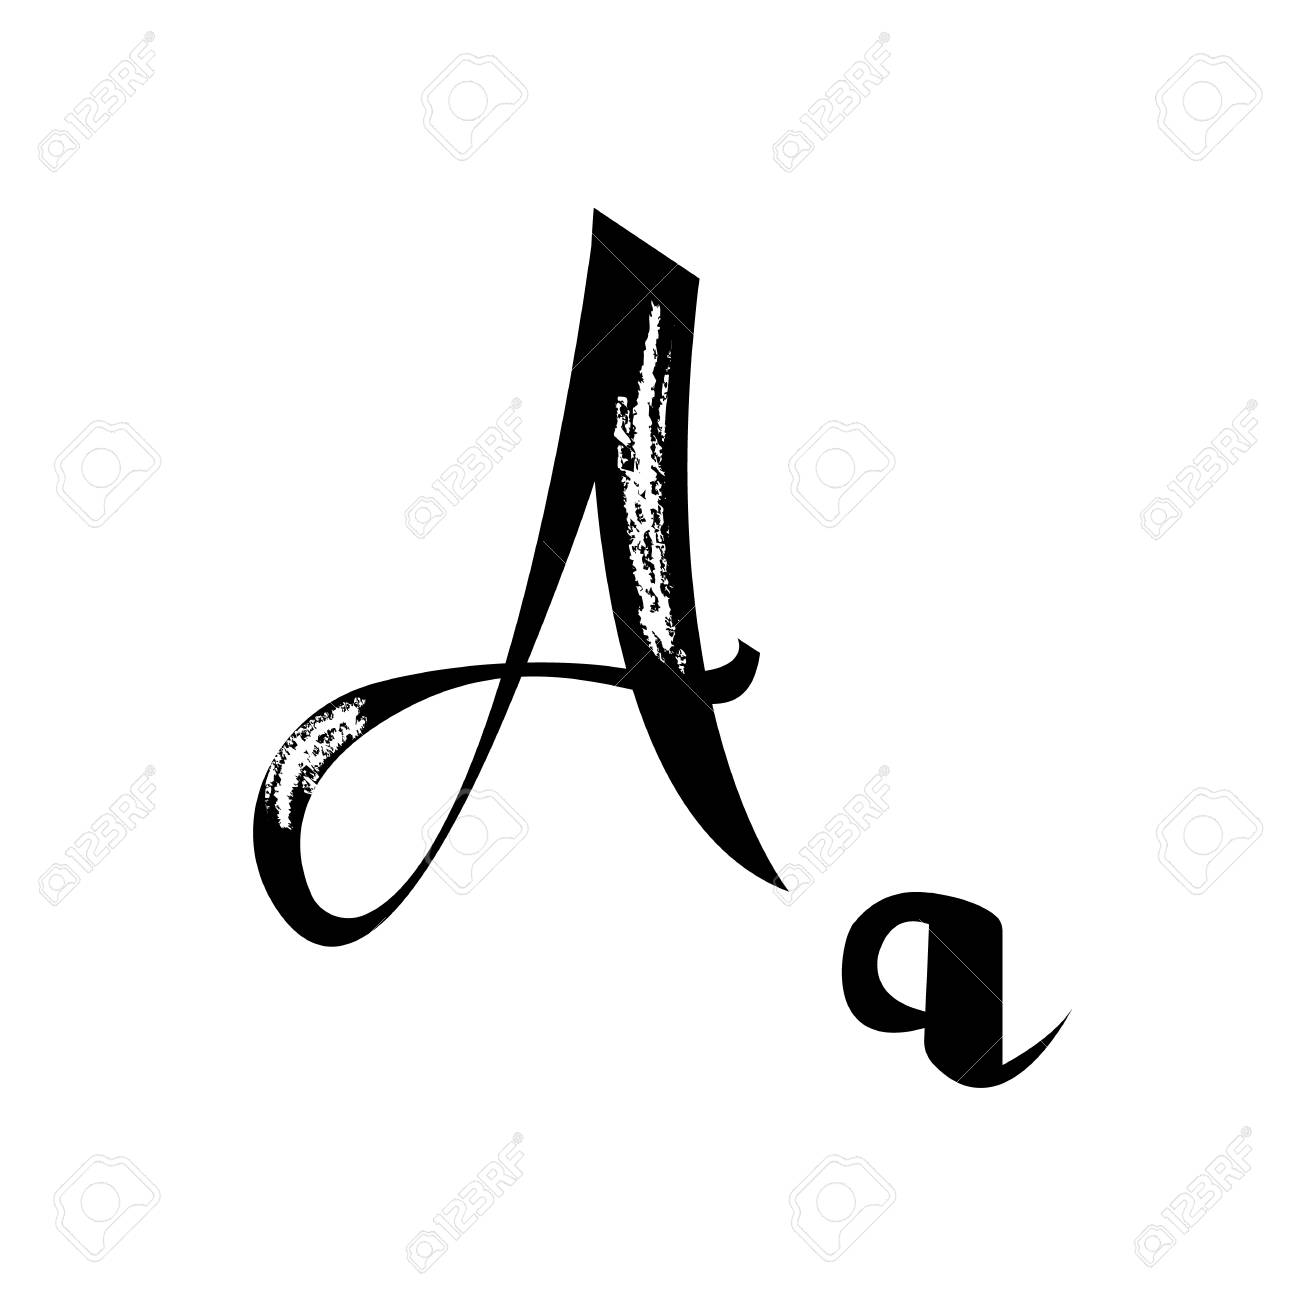 Police De Manuscrit Manuscrit. Lettre B Alphabet Calligraphie ...